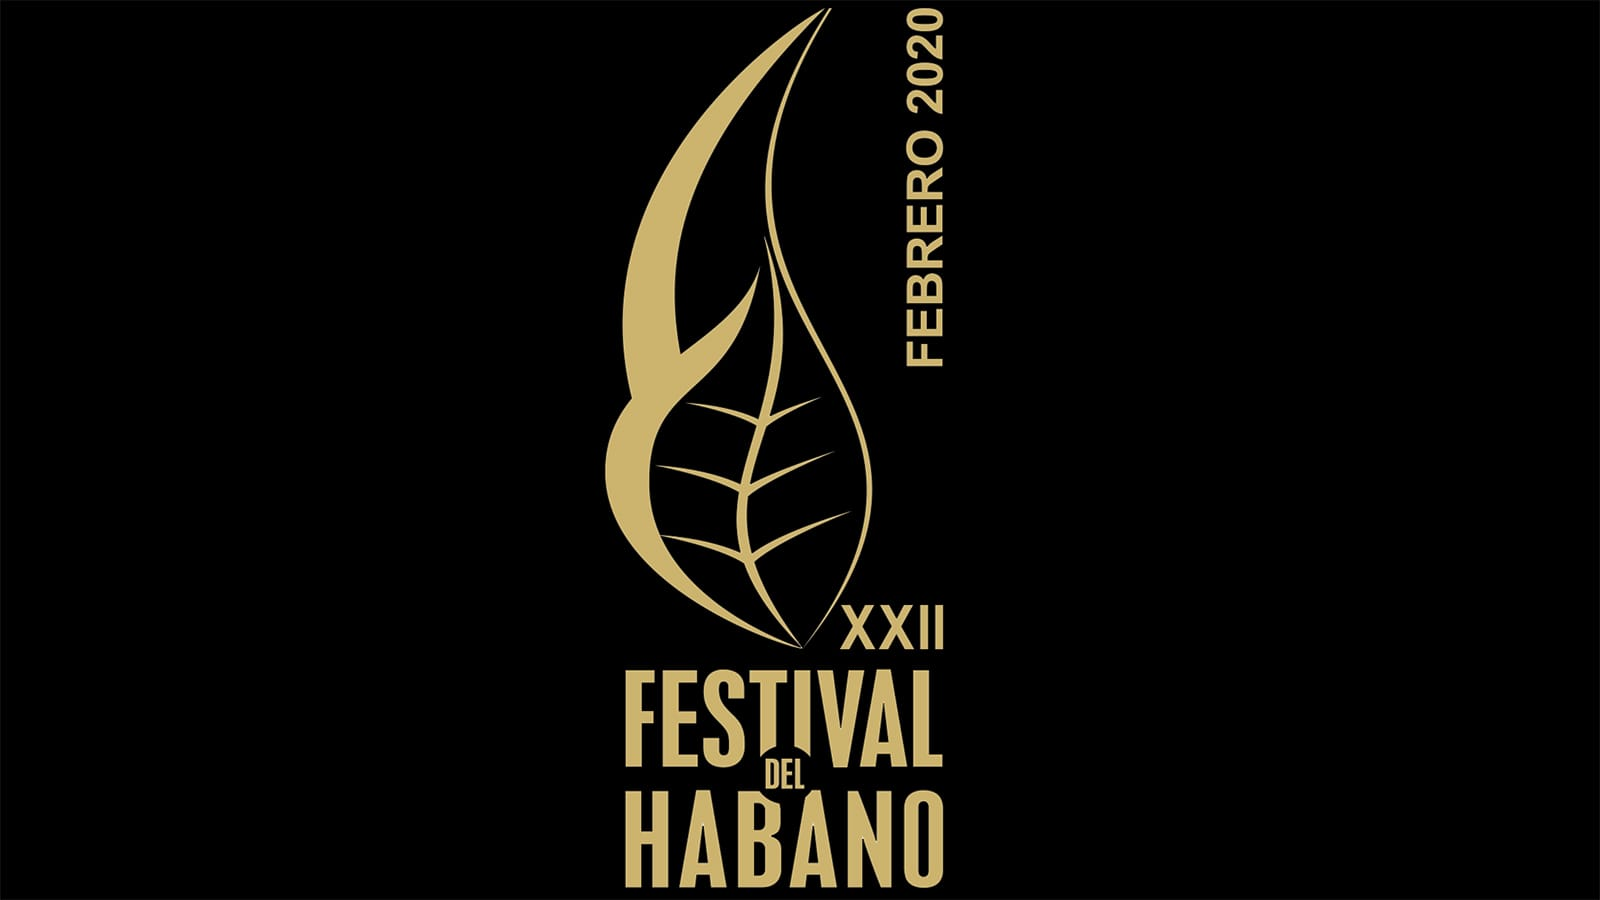 xxli-festival-del-habano-szivarfesztival-kuba-szivarom_1.jpg